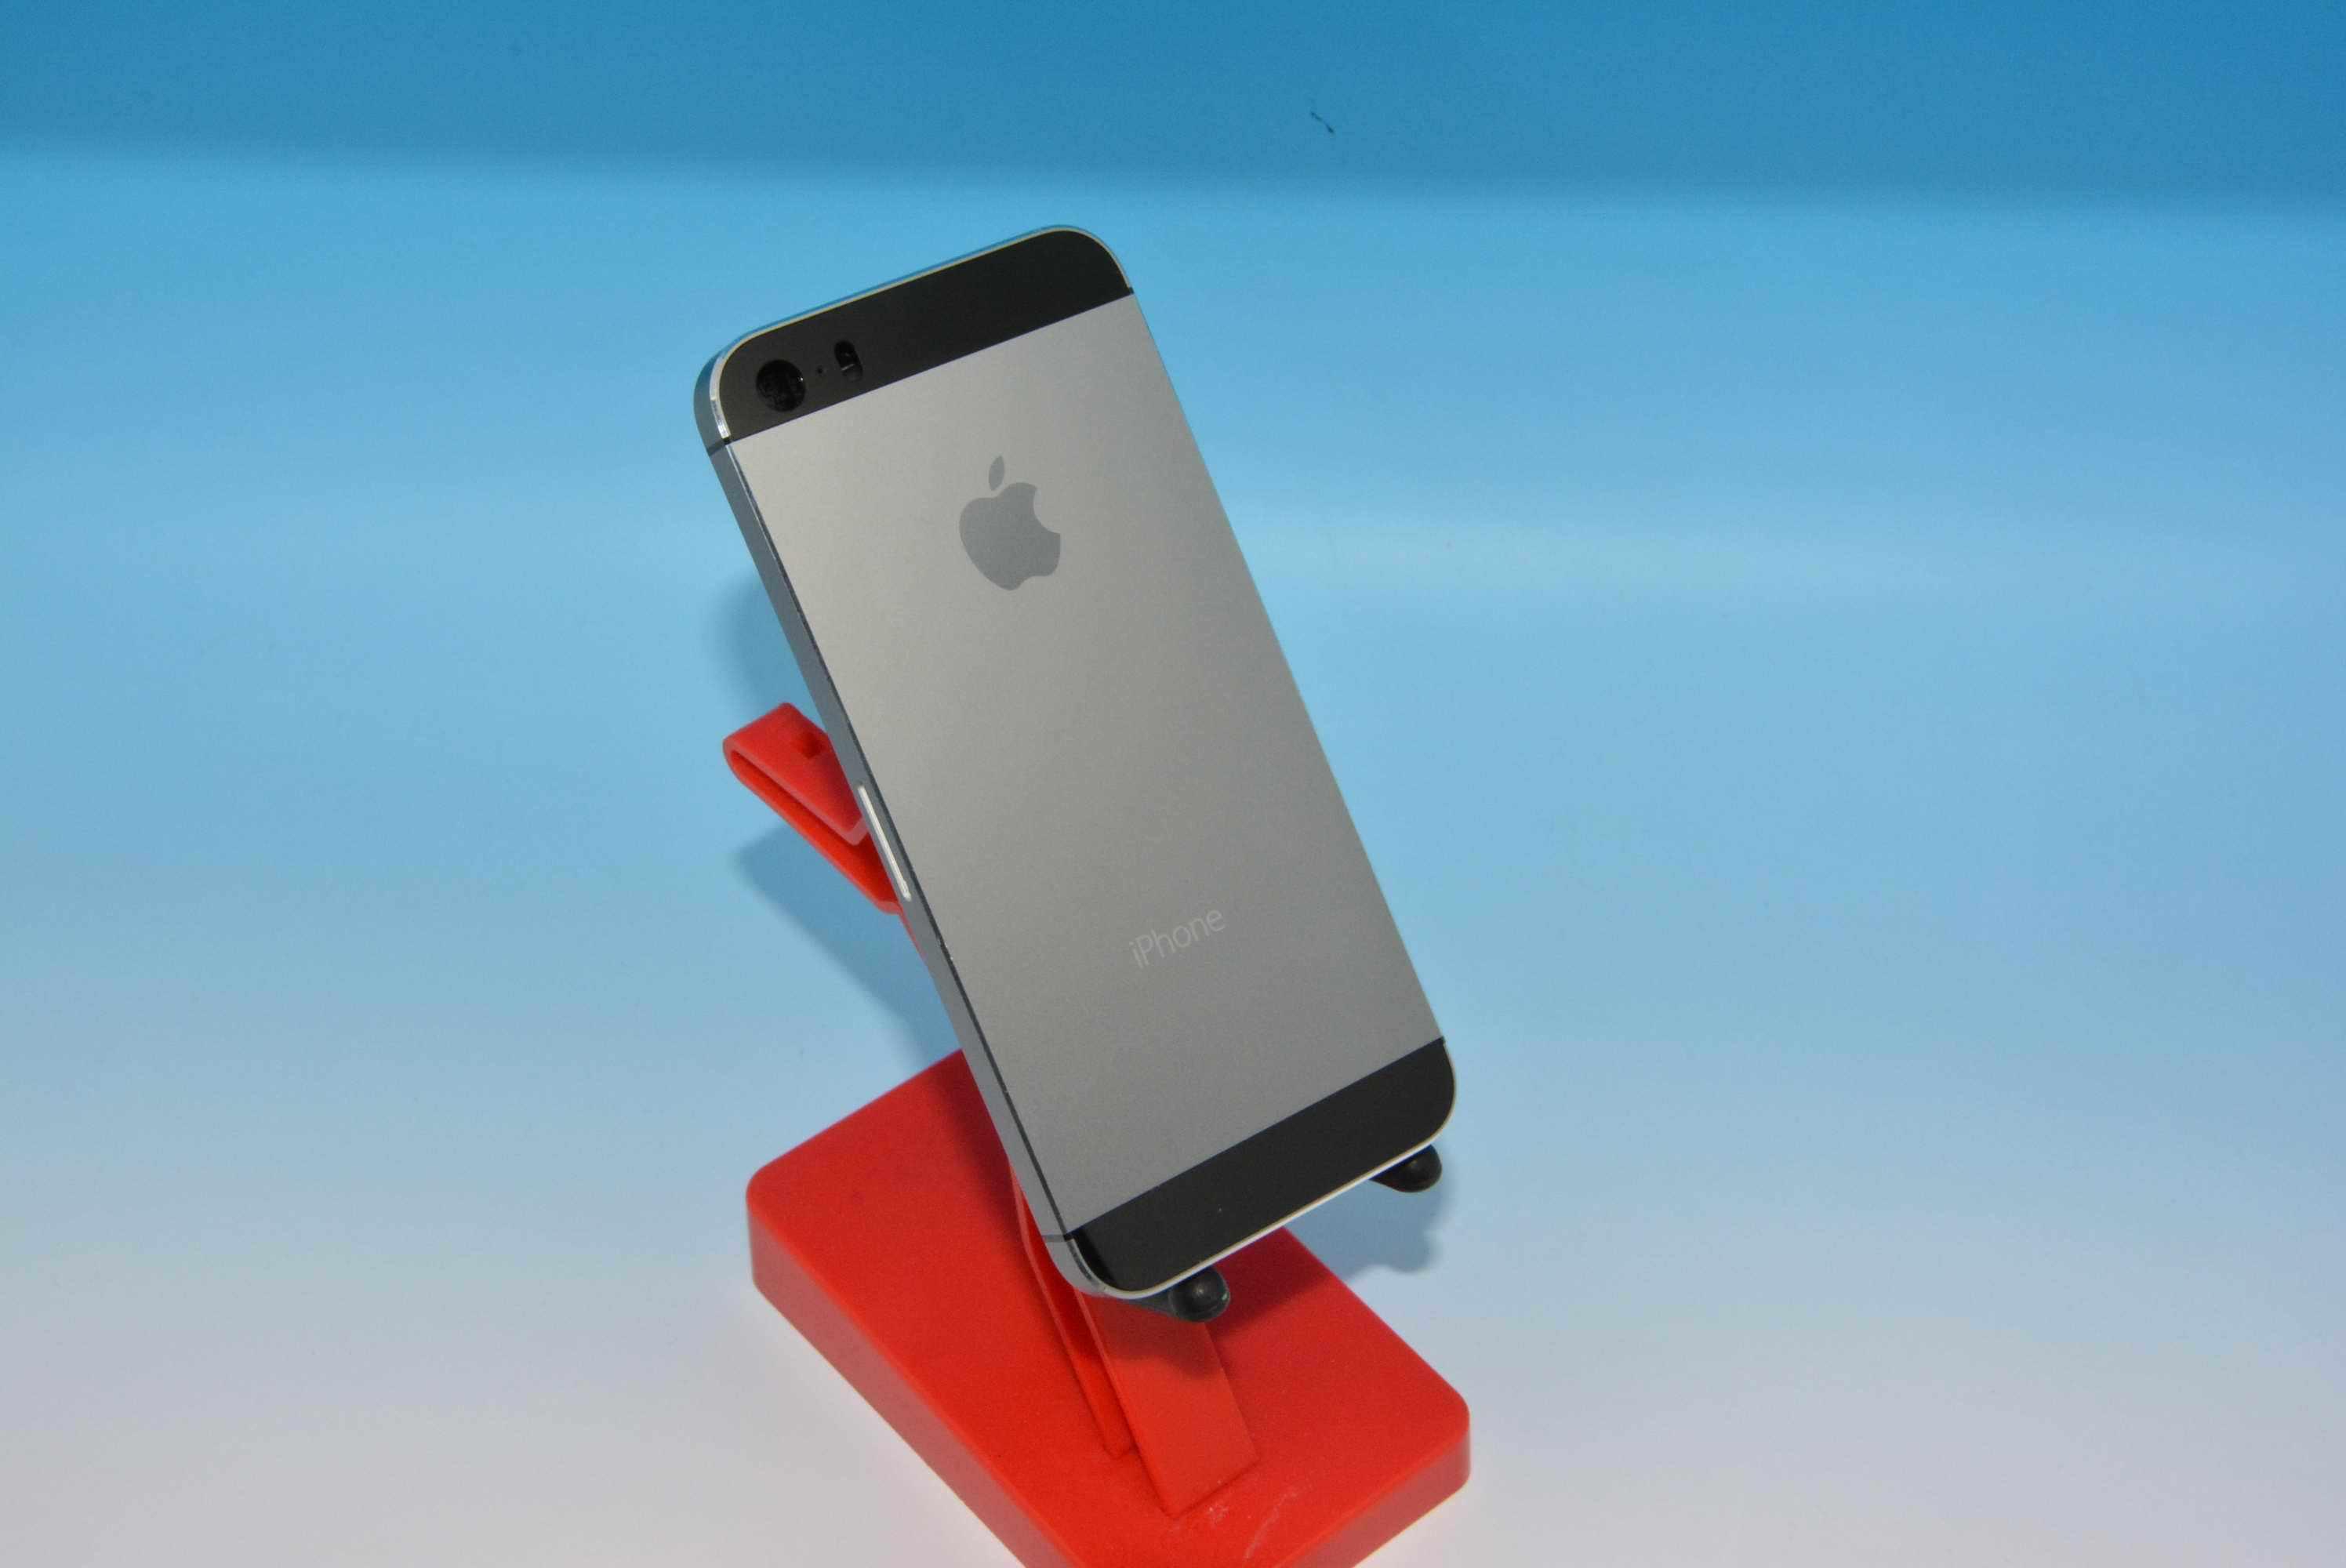 IPhone 5S Graphite / Gray Case